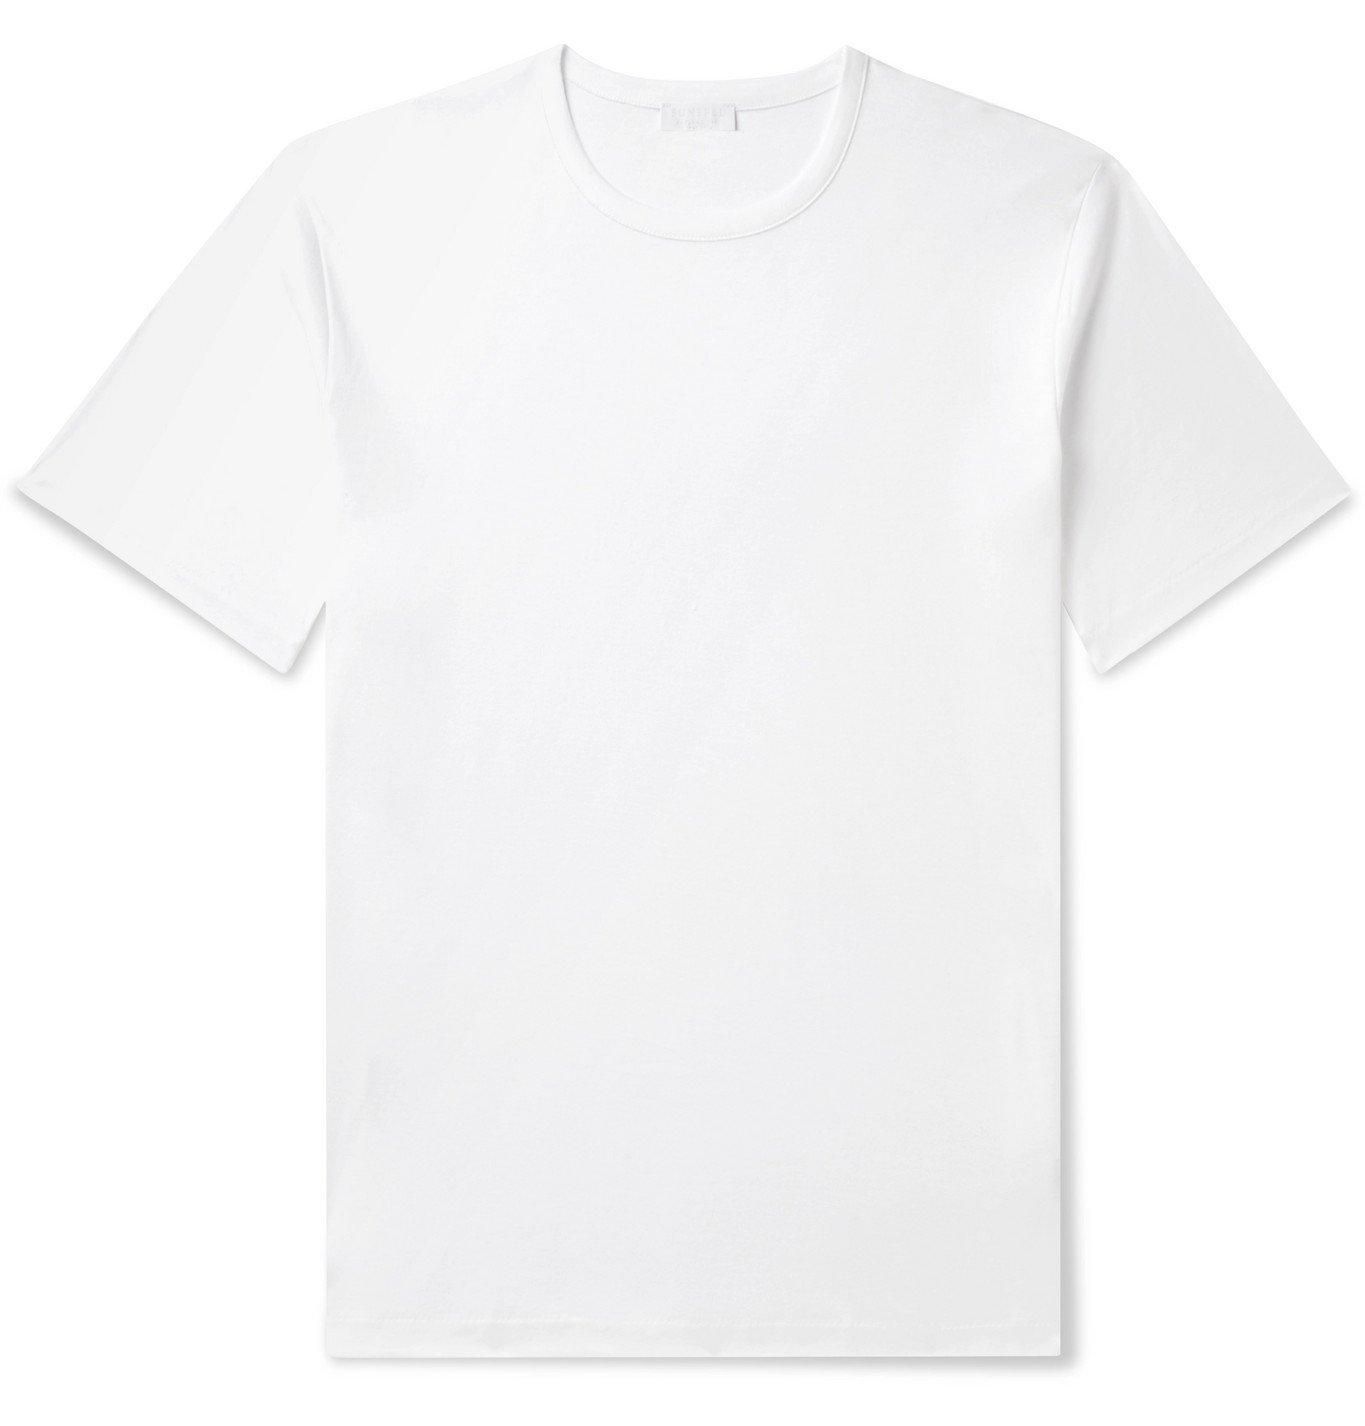 Sunspel - Sea Island Cotton-Jersey T-Shirt - White